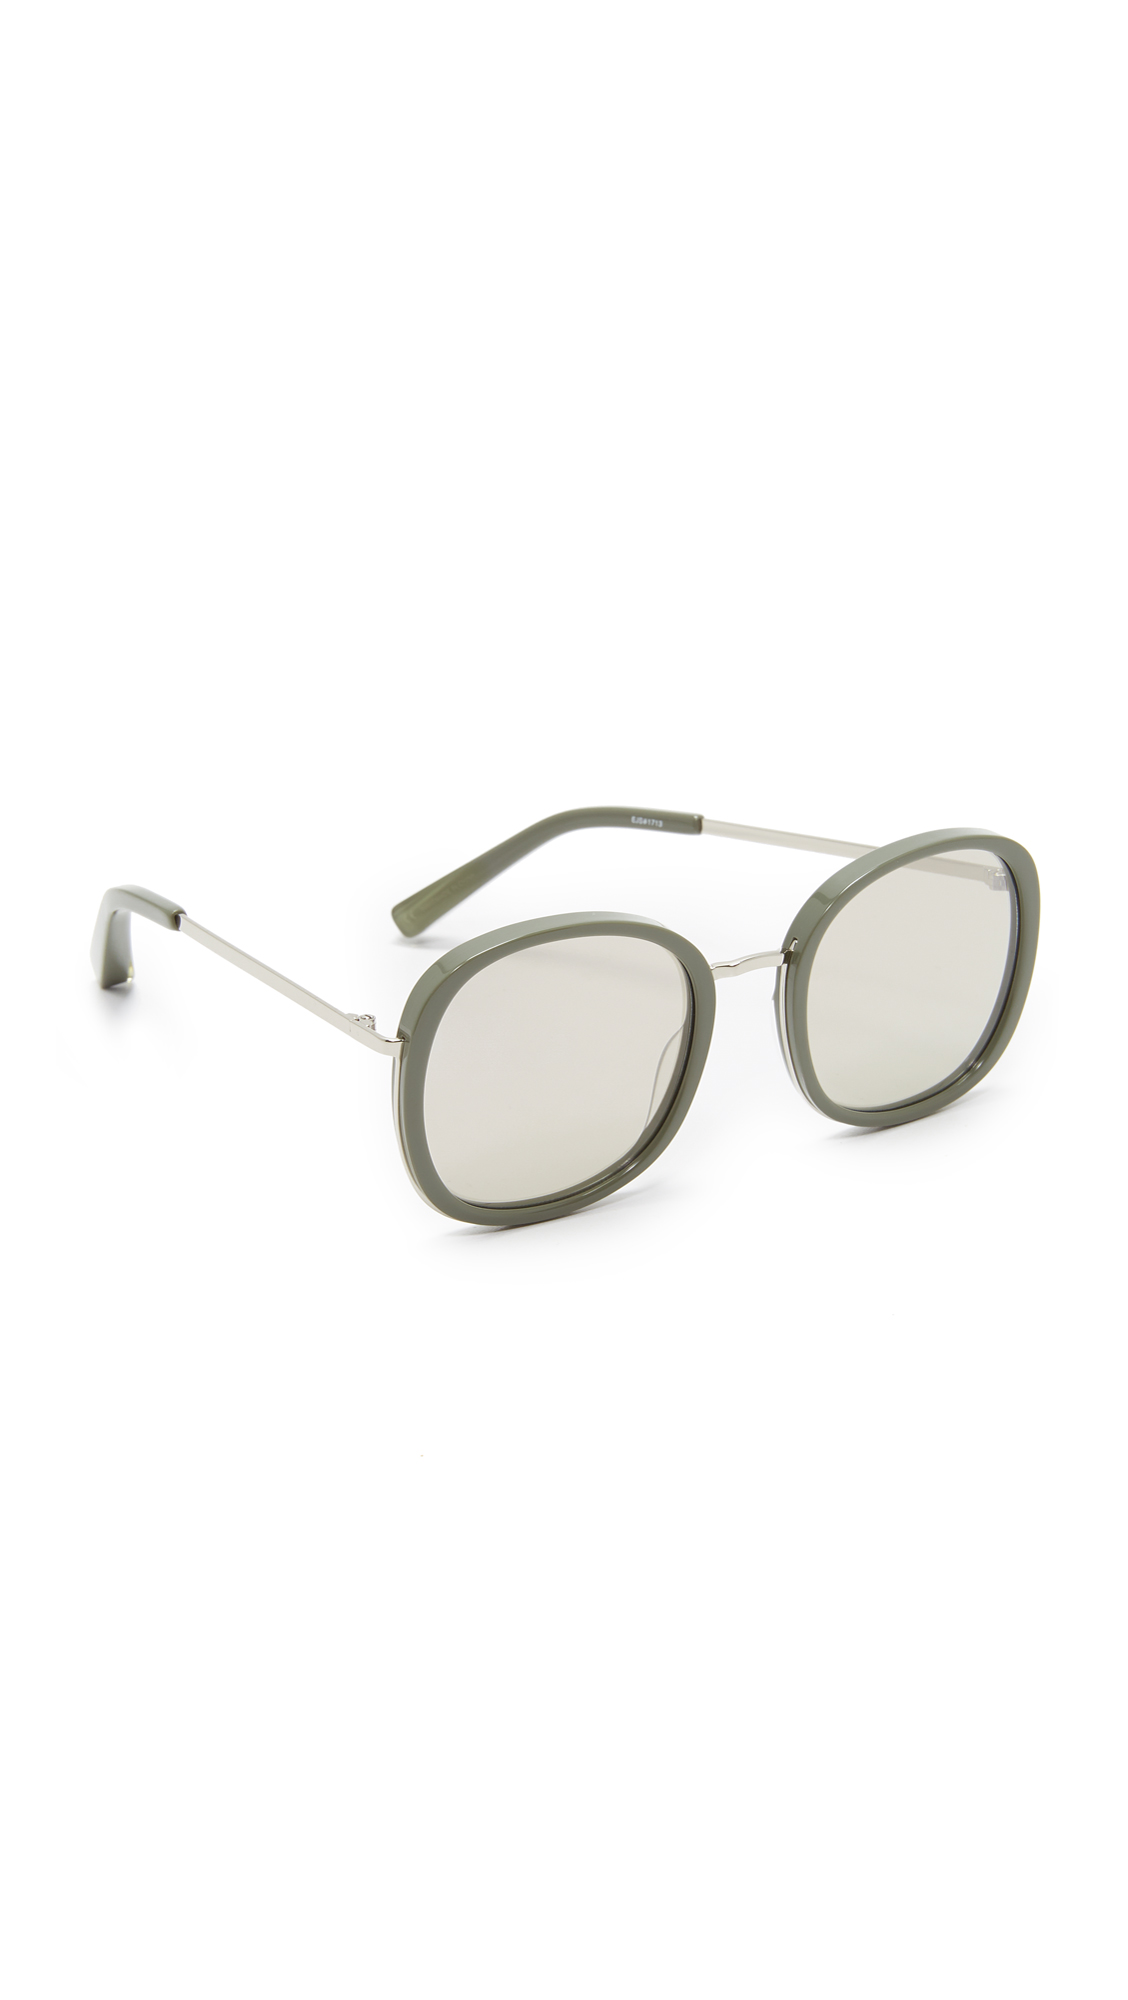 Elizabeth and James Jones Sunglasses - Tortoise/Blue